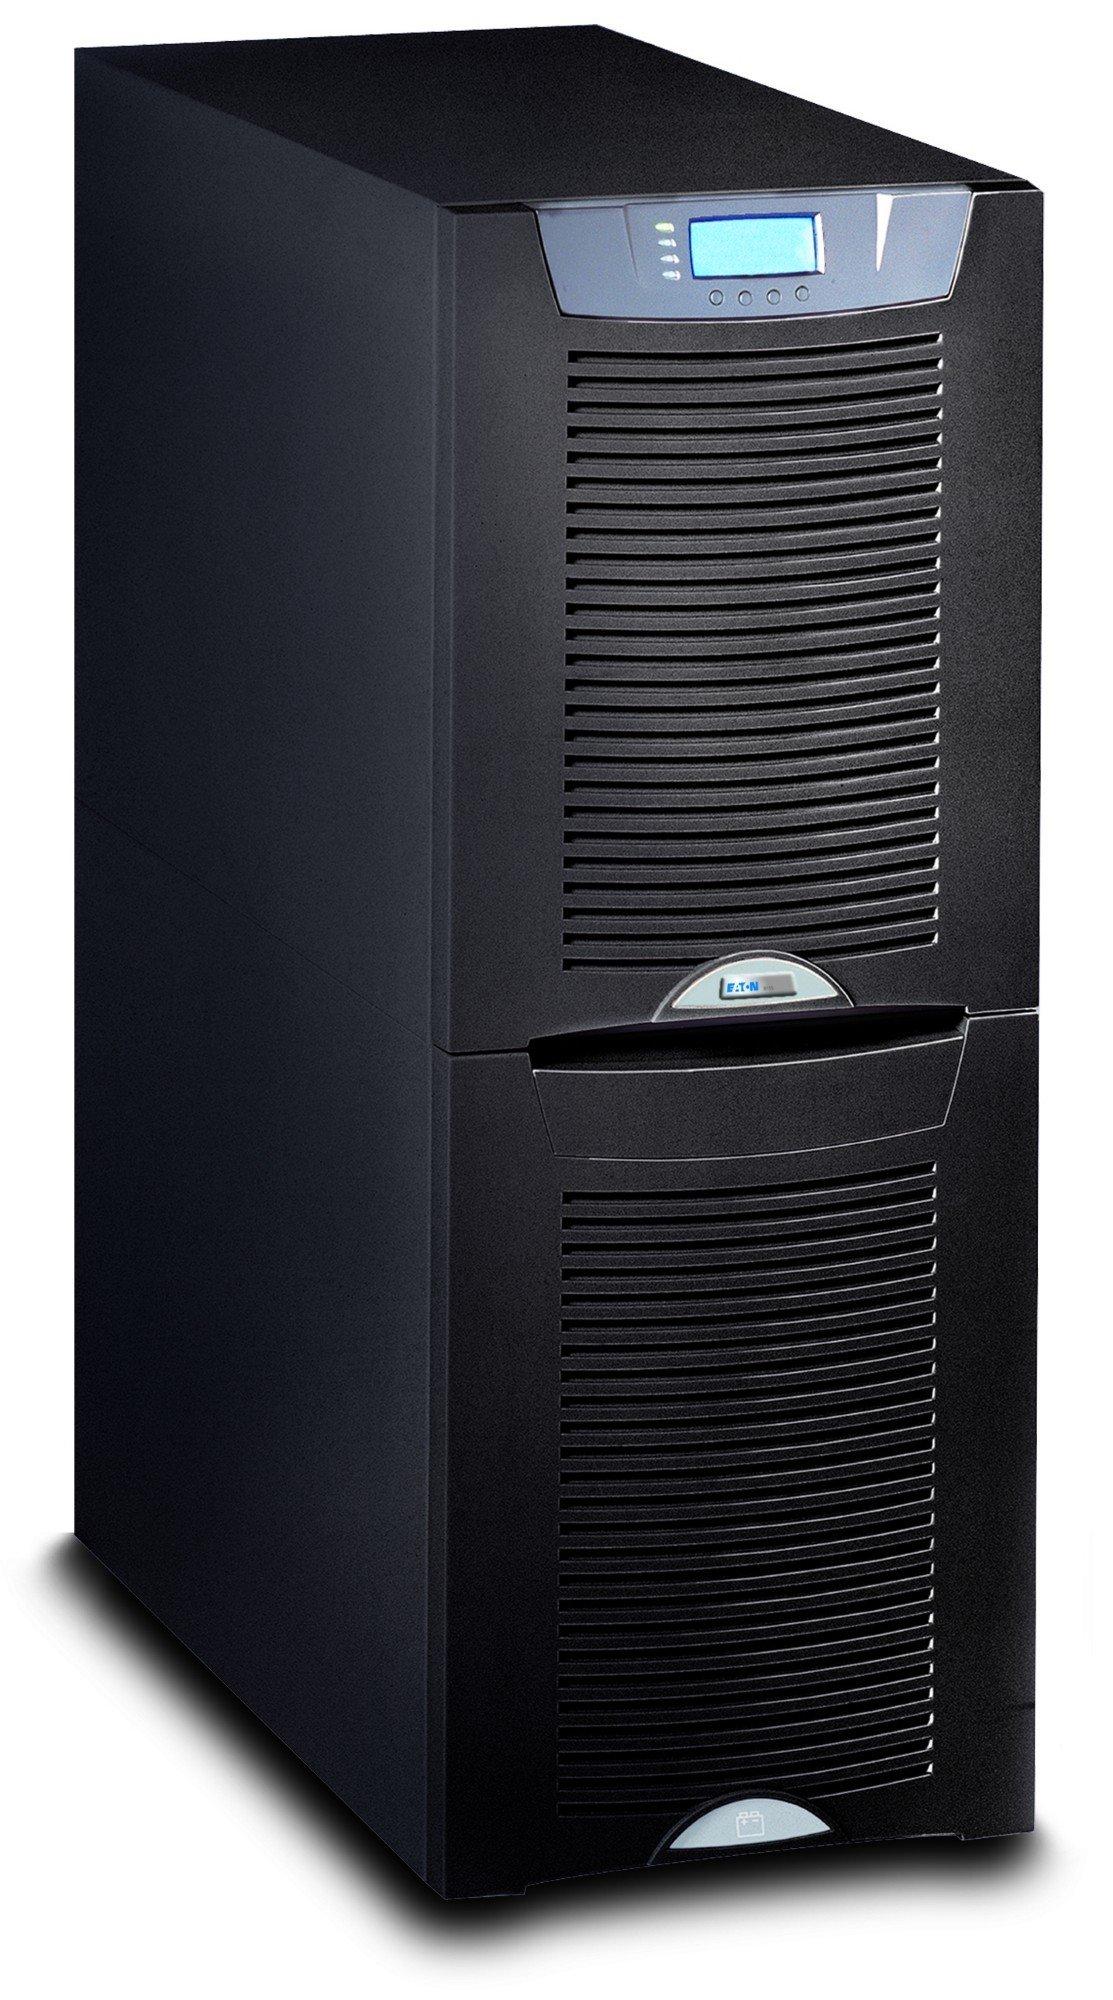 An image of Eaton powerware 9155-8-nlhs-28-64x7ah uninterruptible power supply (ups) 8000 va